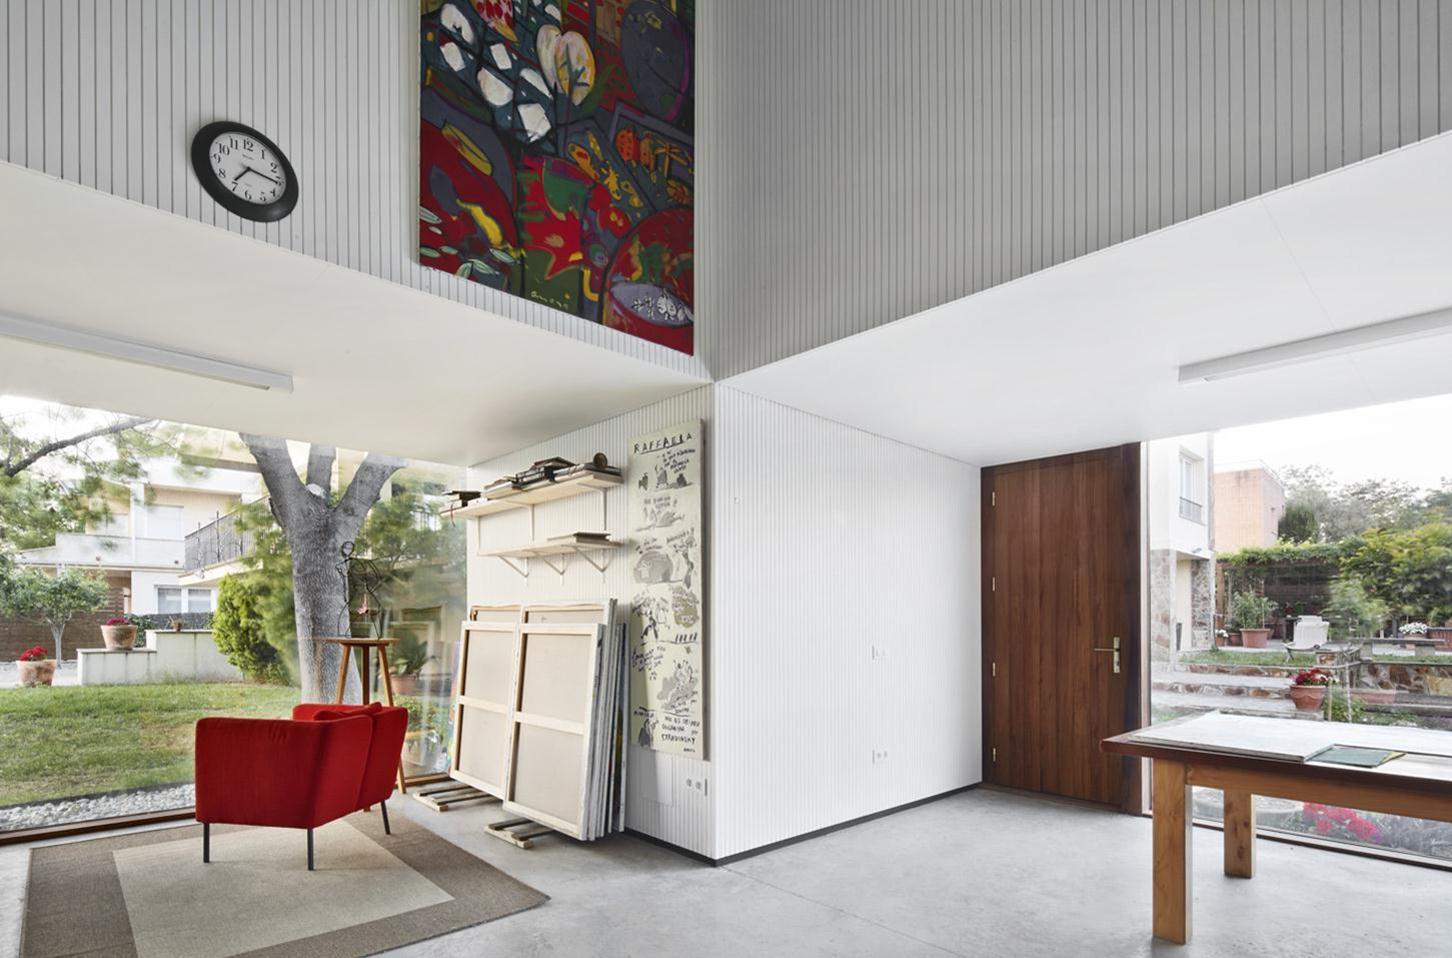 Artist's Studio / Josep Camps - Olga Felip (8)